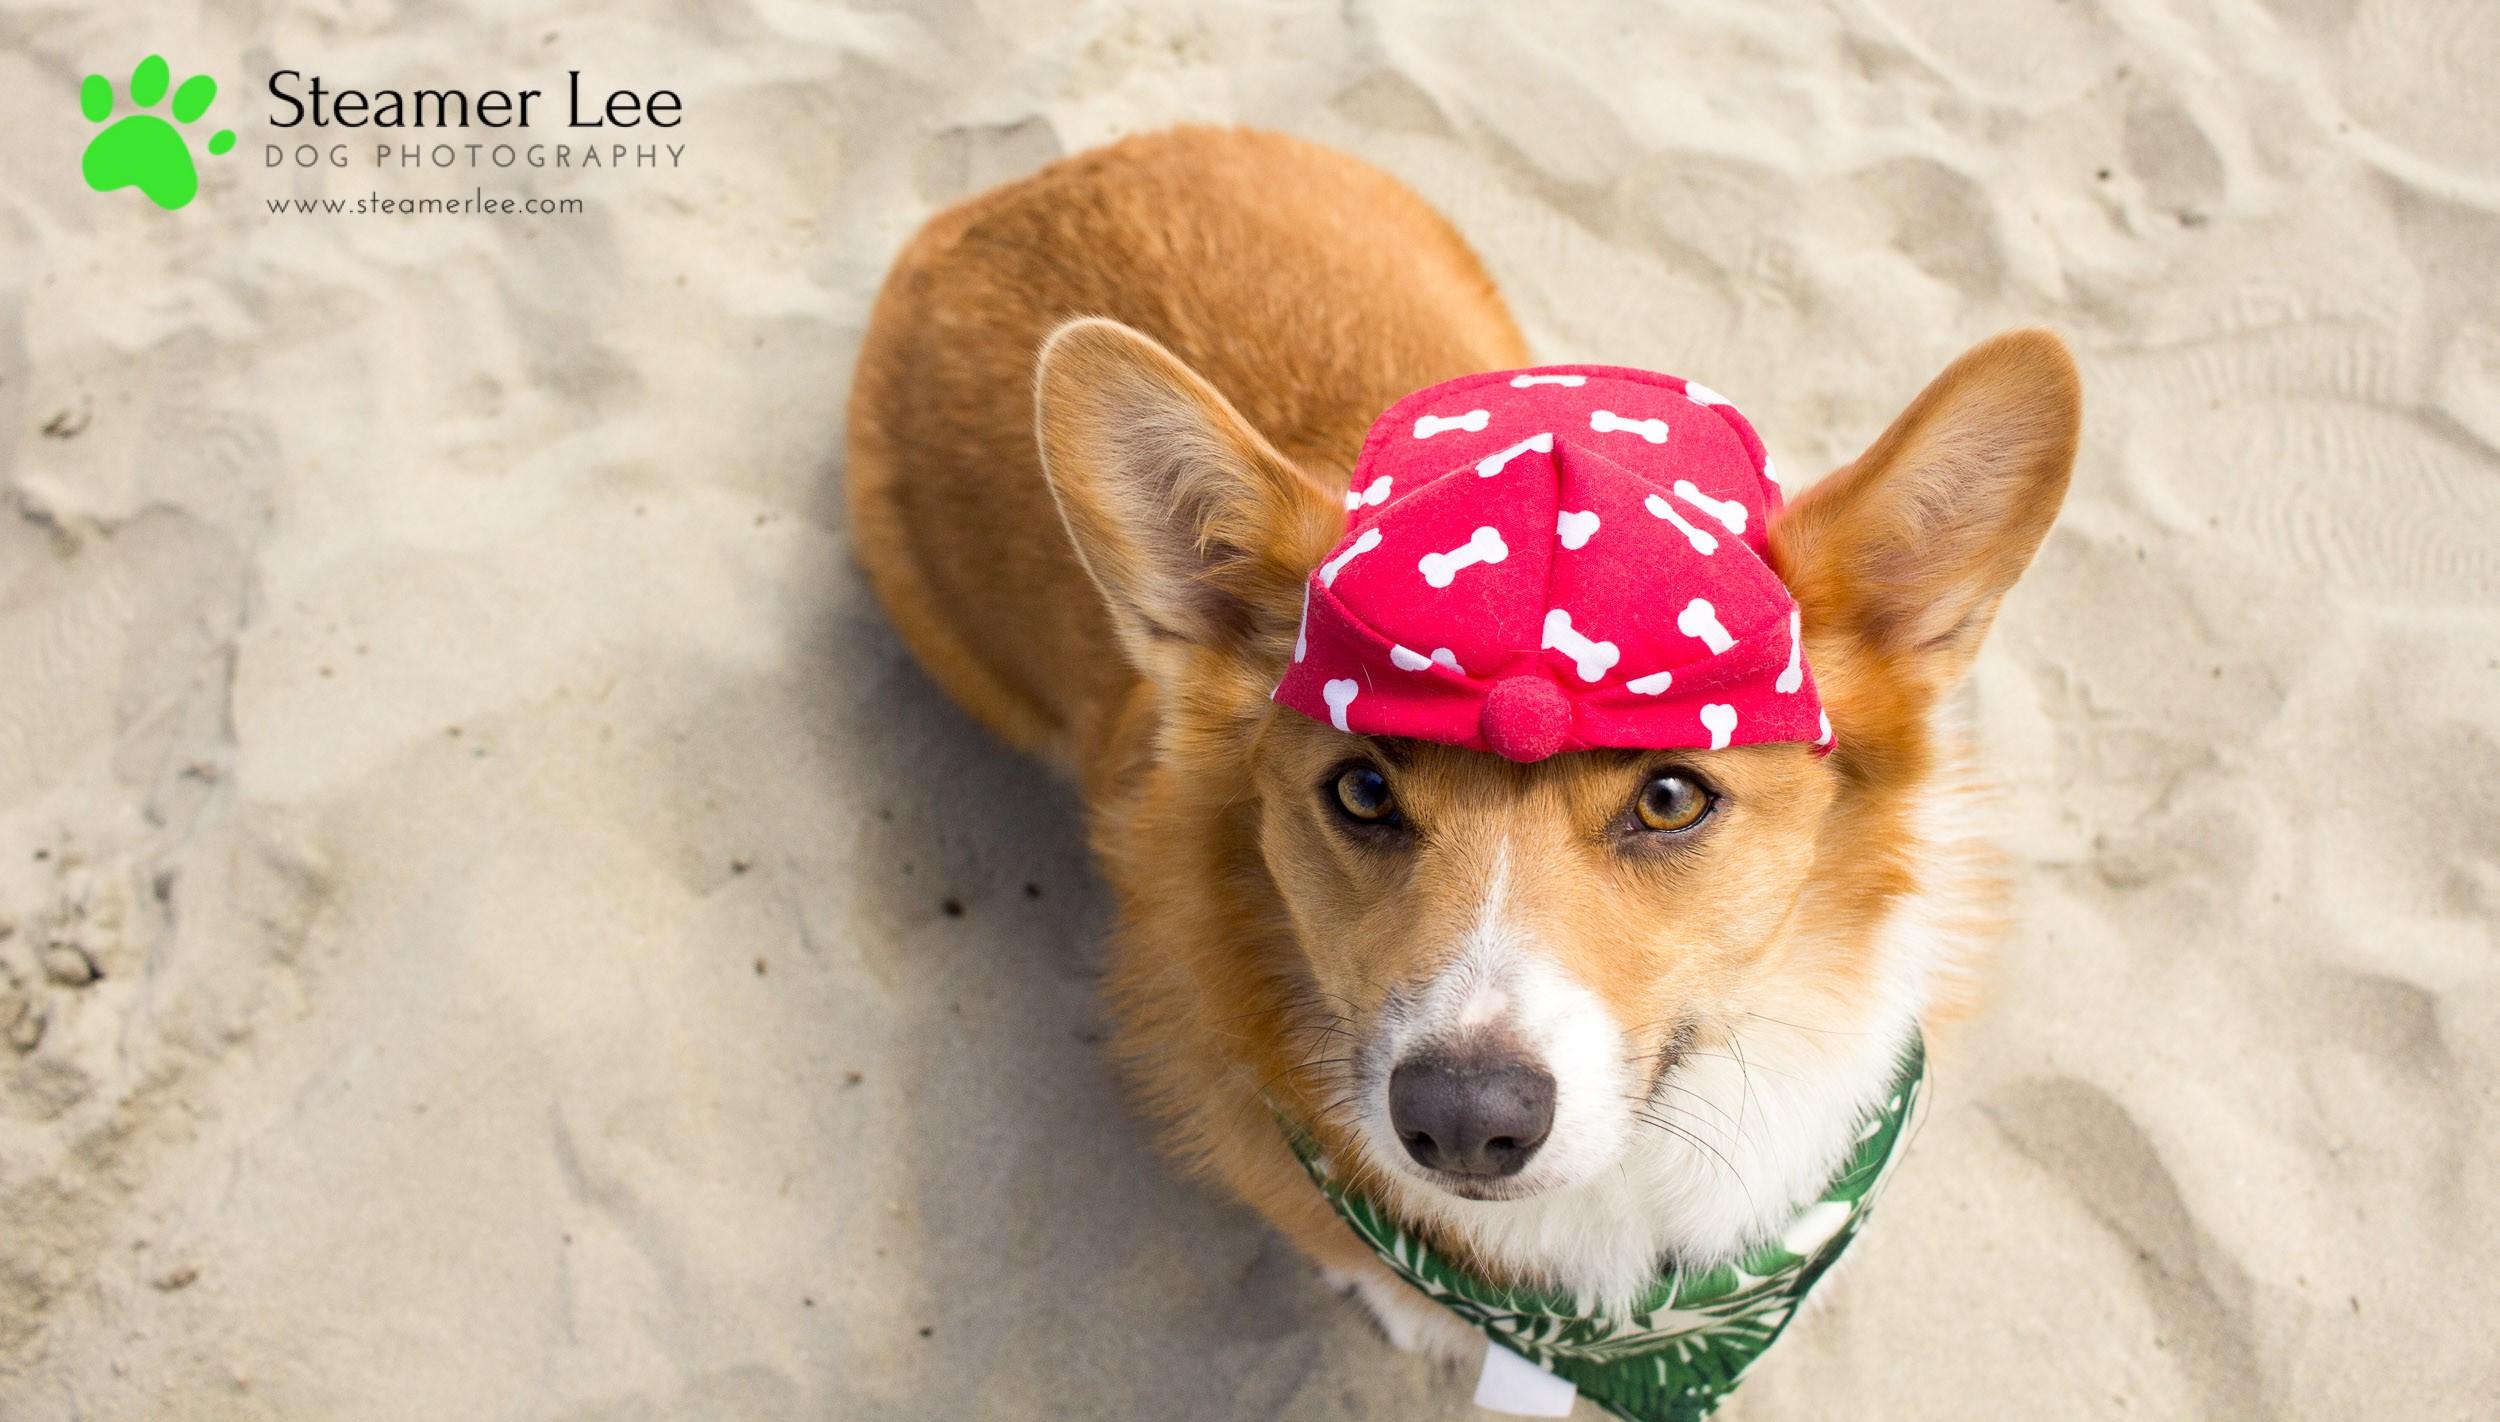 Steamer Lee Dog Photography - July 2017 So Cal Corgi Beach Day - Vol. 3 - 25.jpg